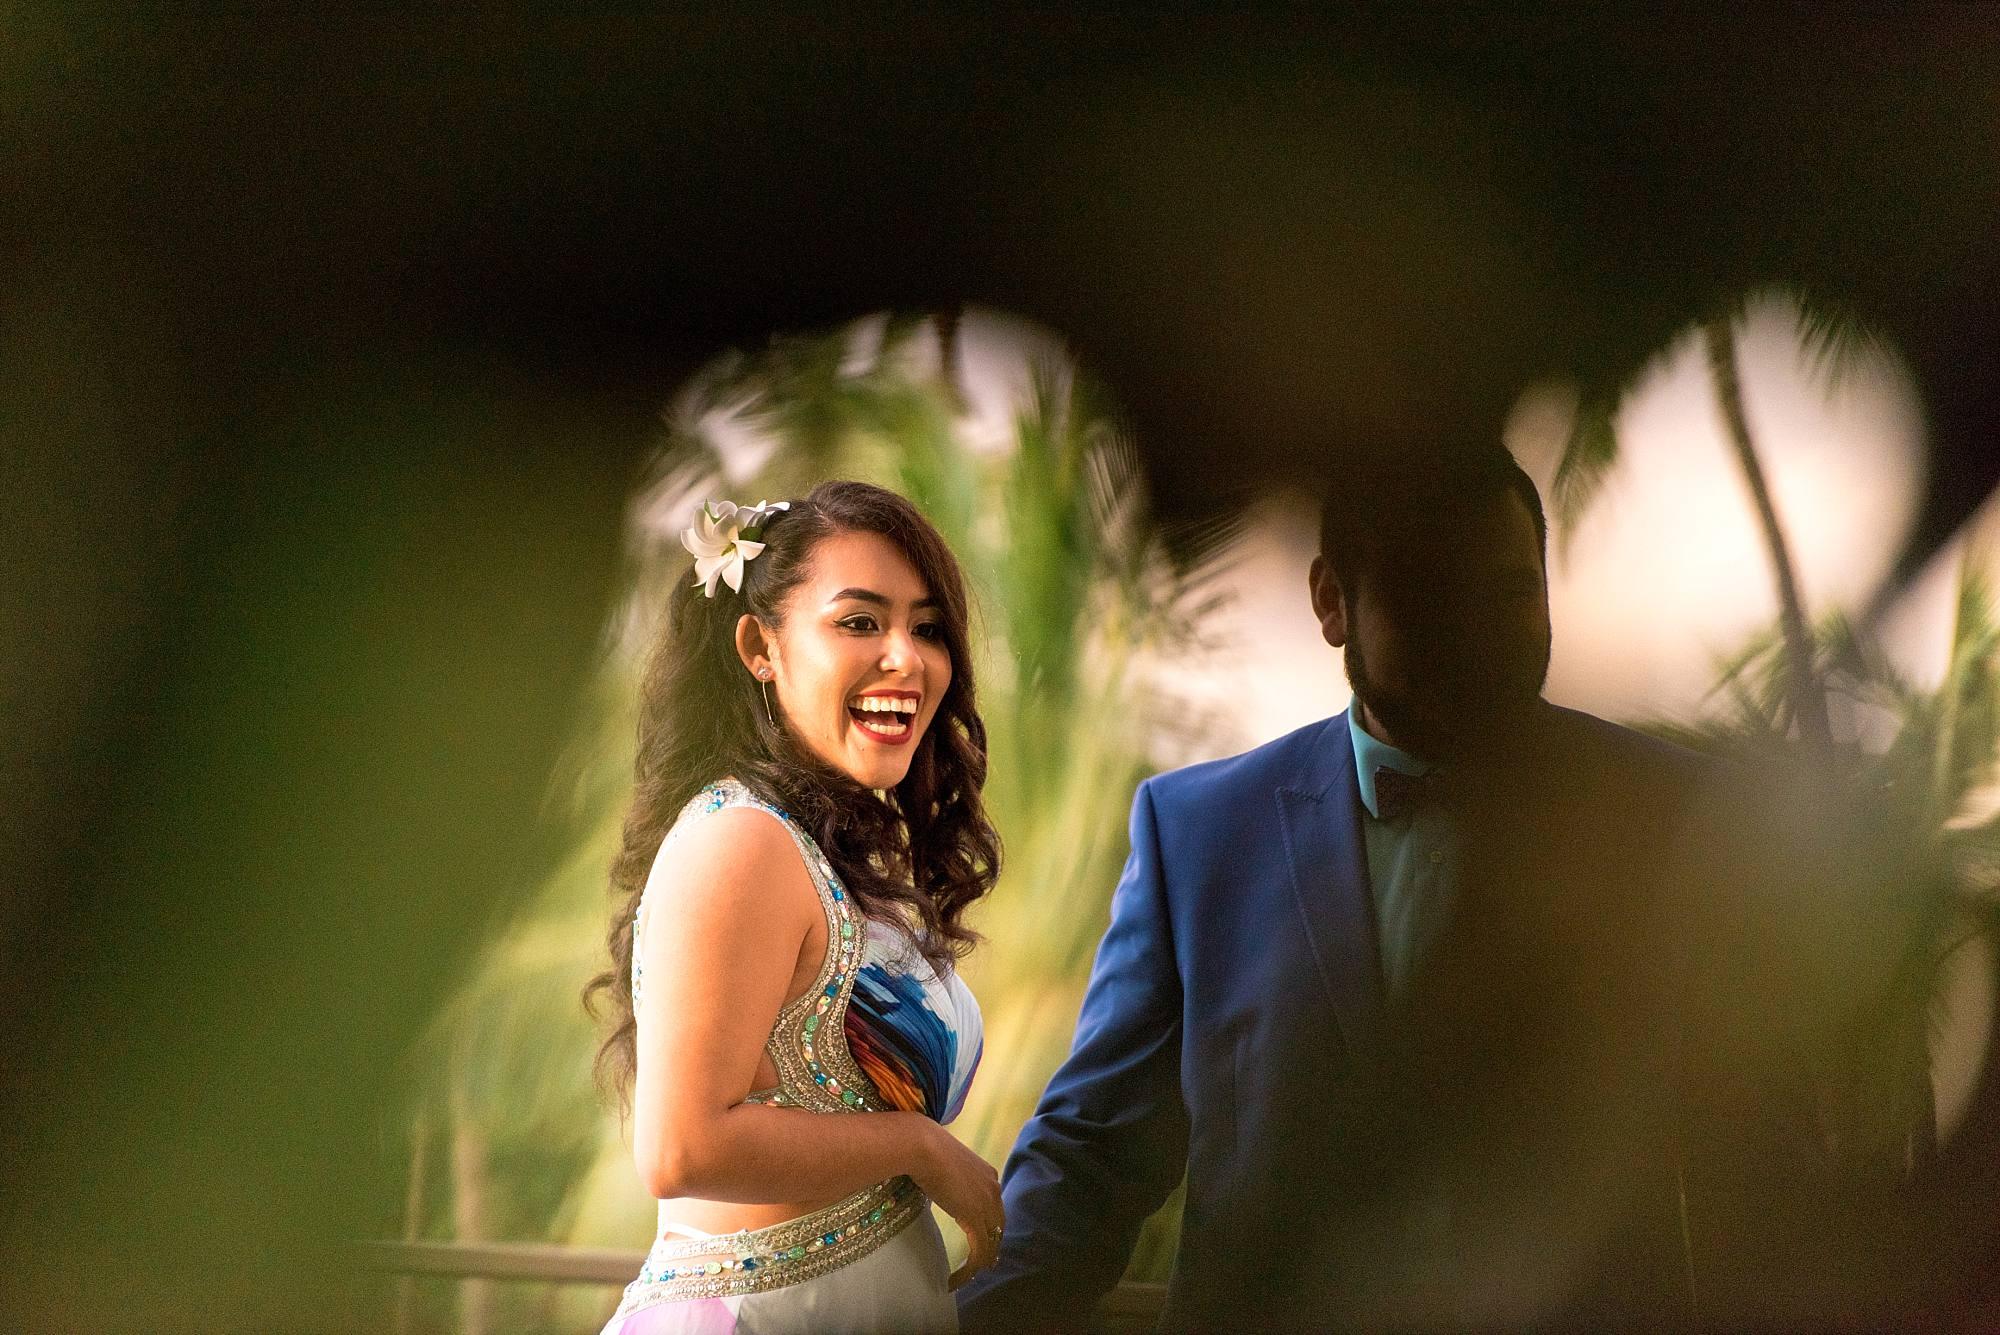 woman flashing a beautiful smile